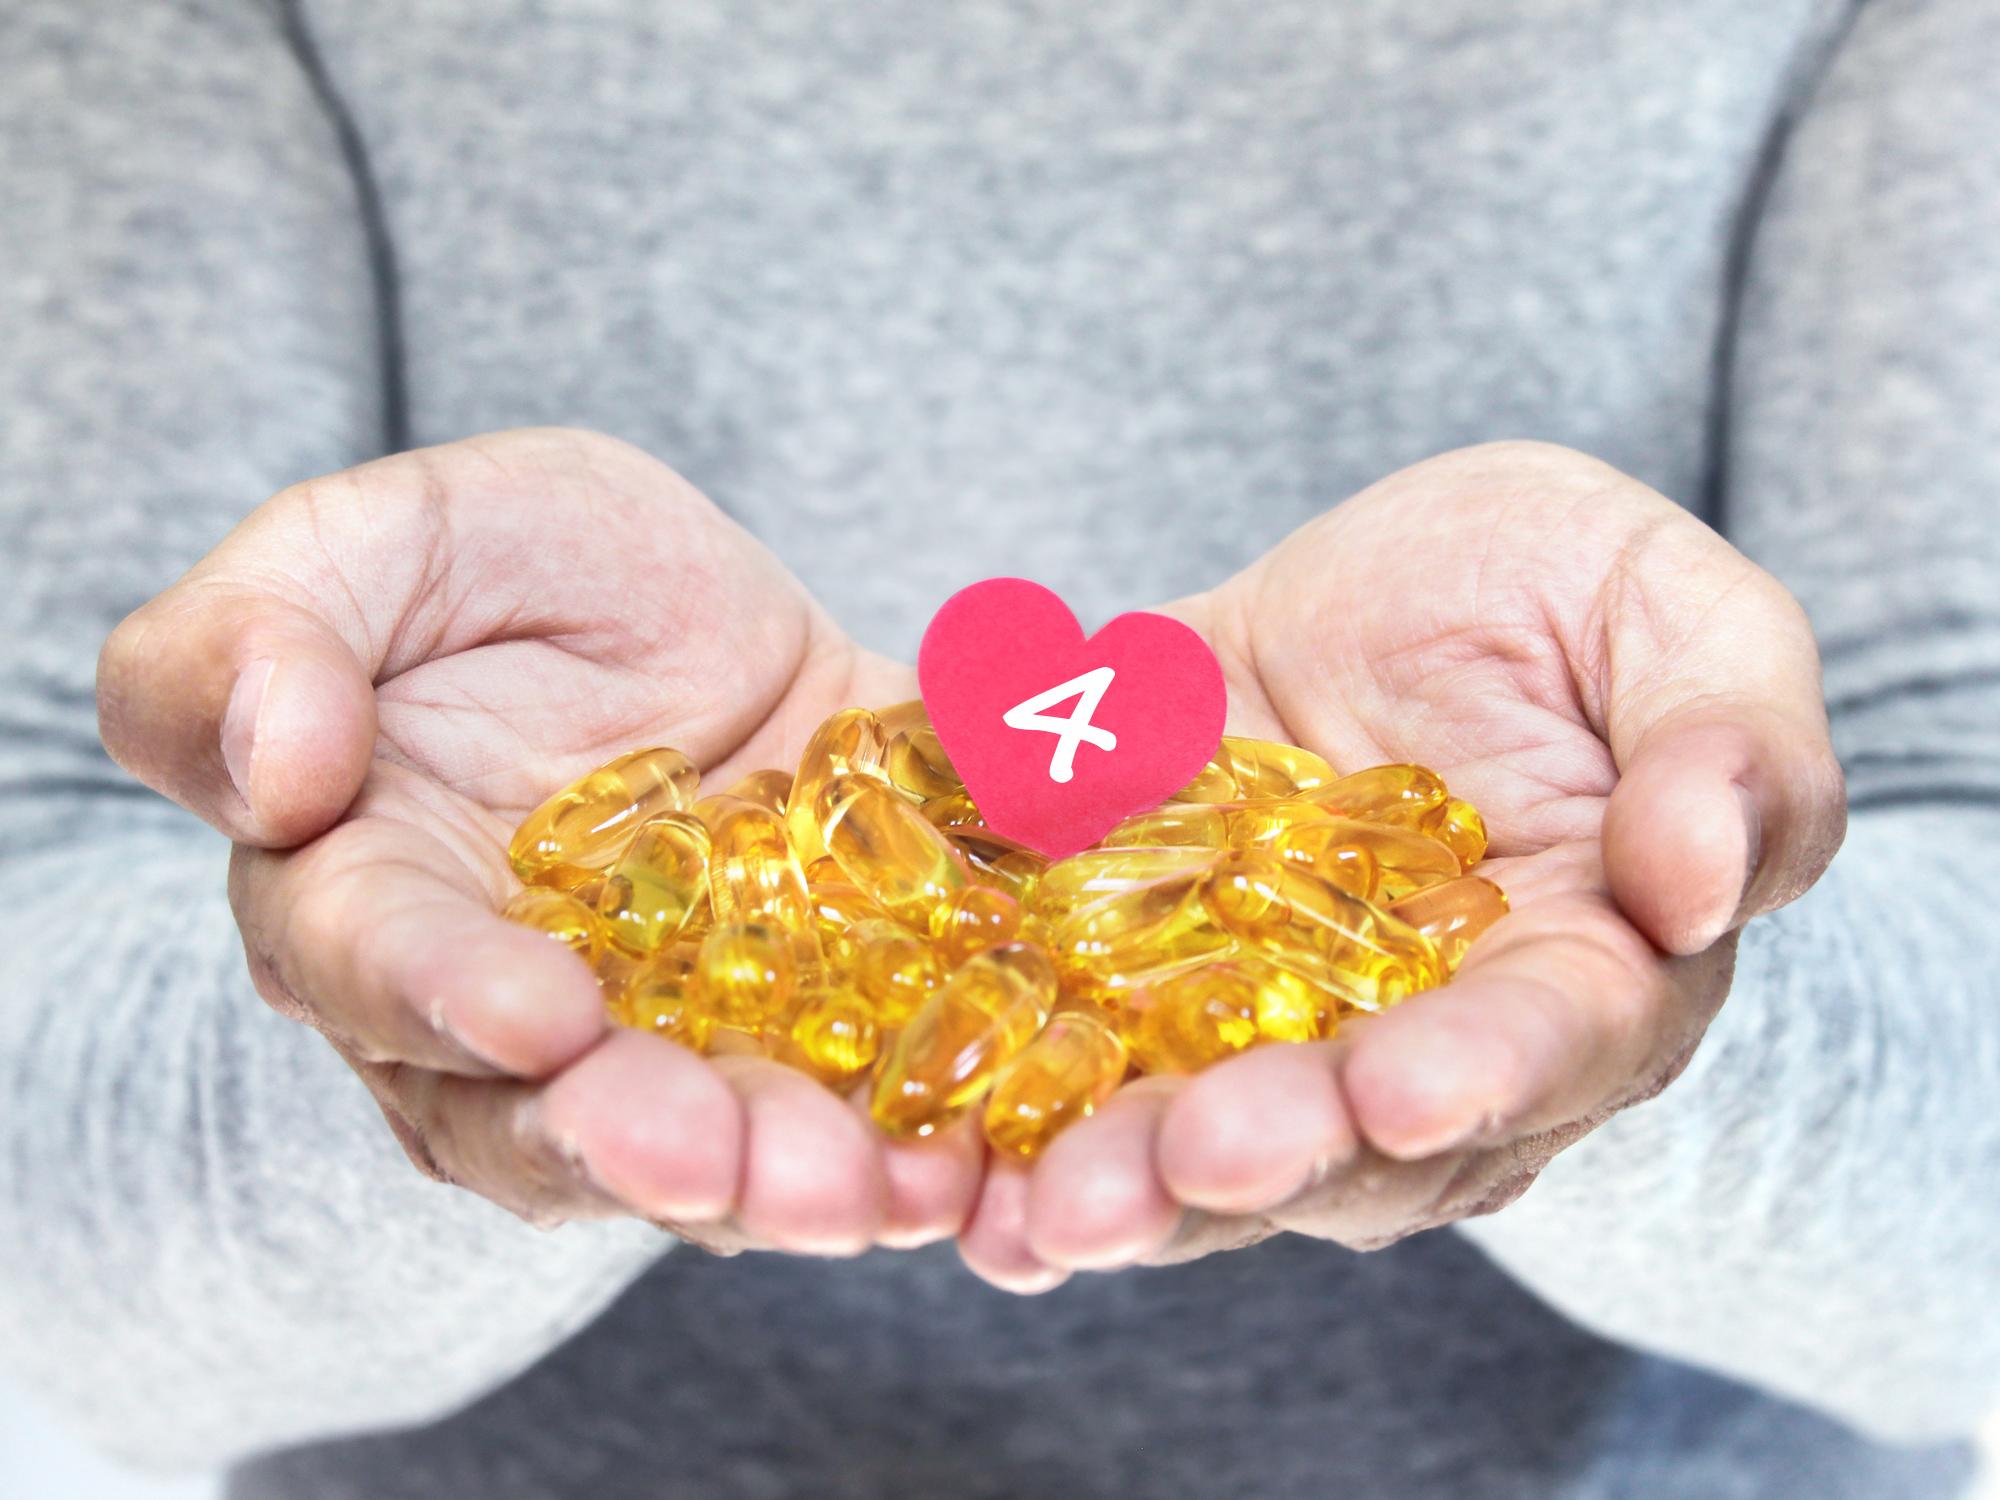 4 ways this simple vitamin undoes heart damage